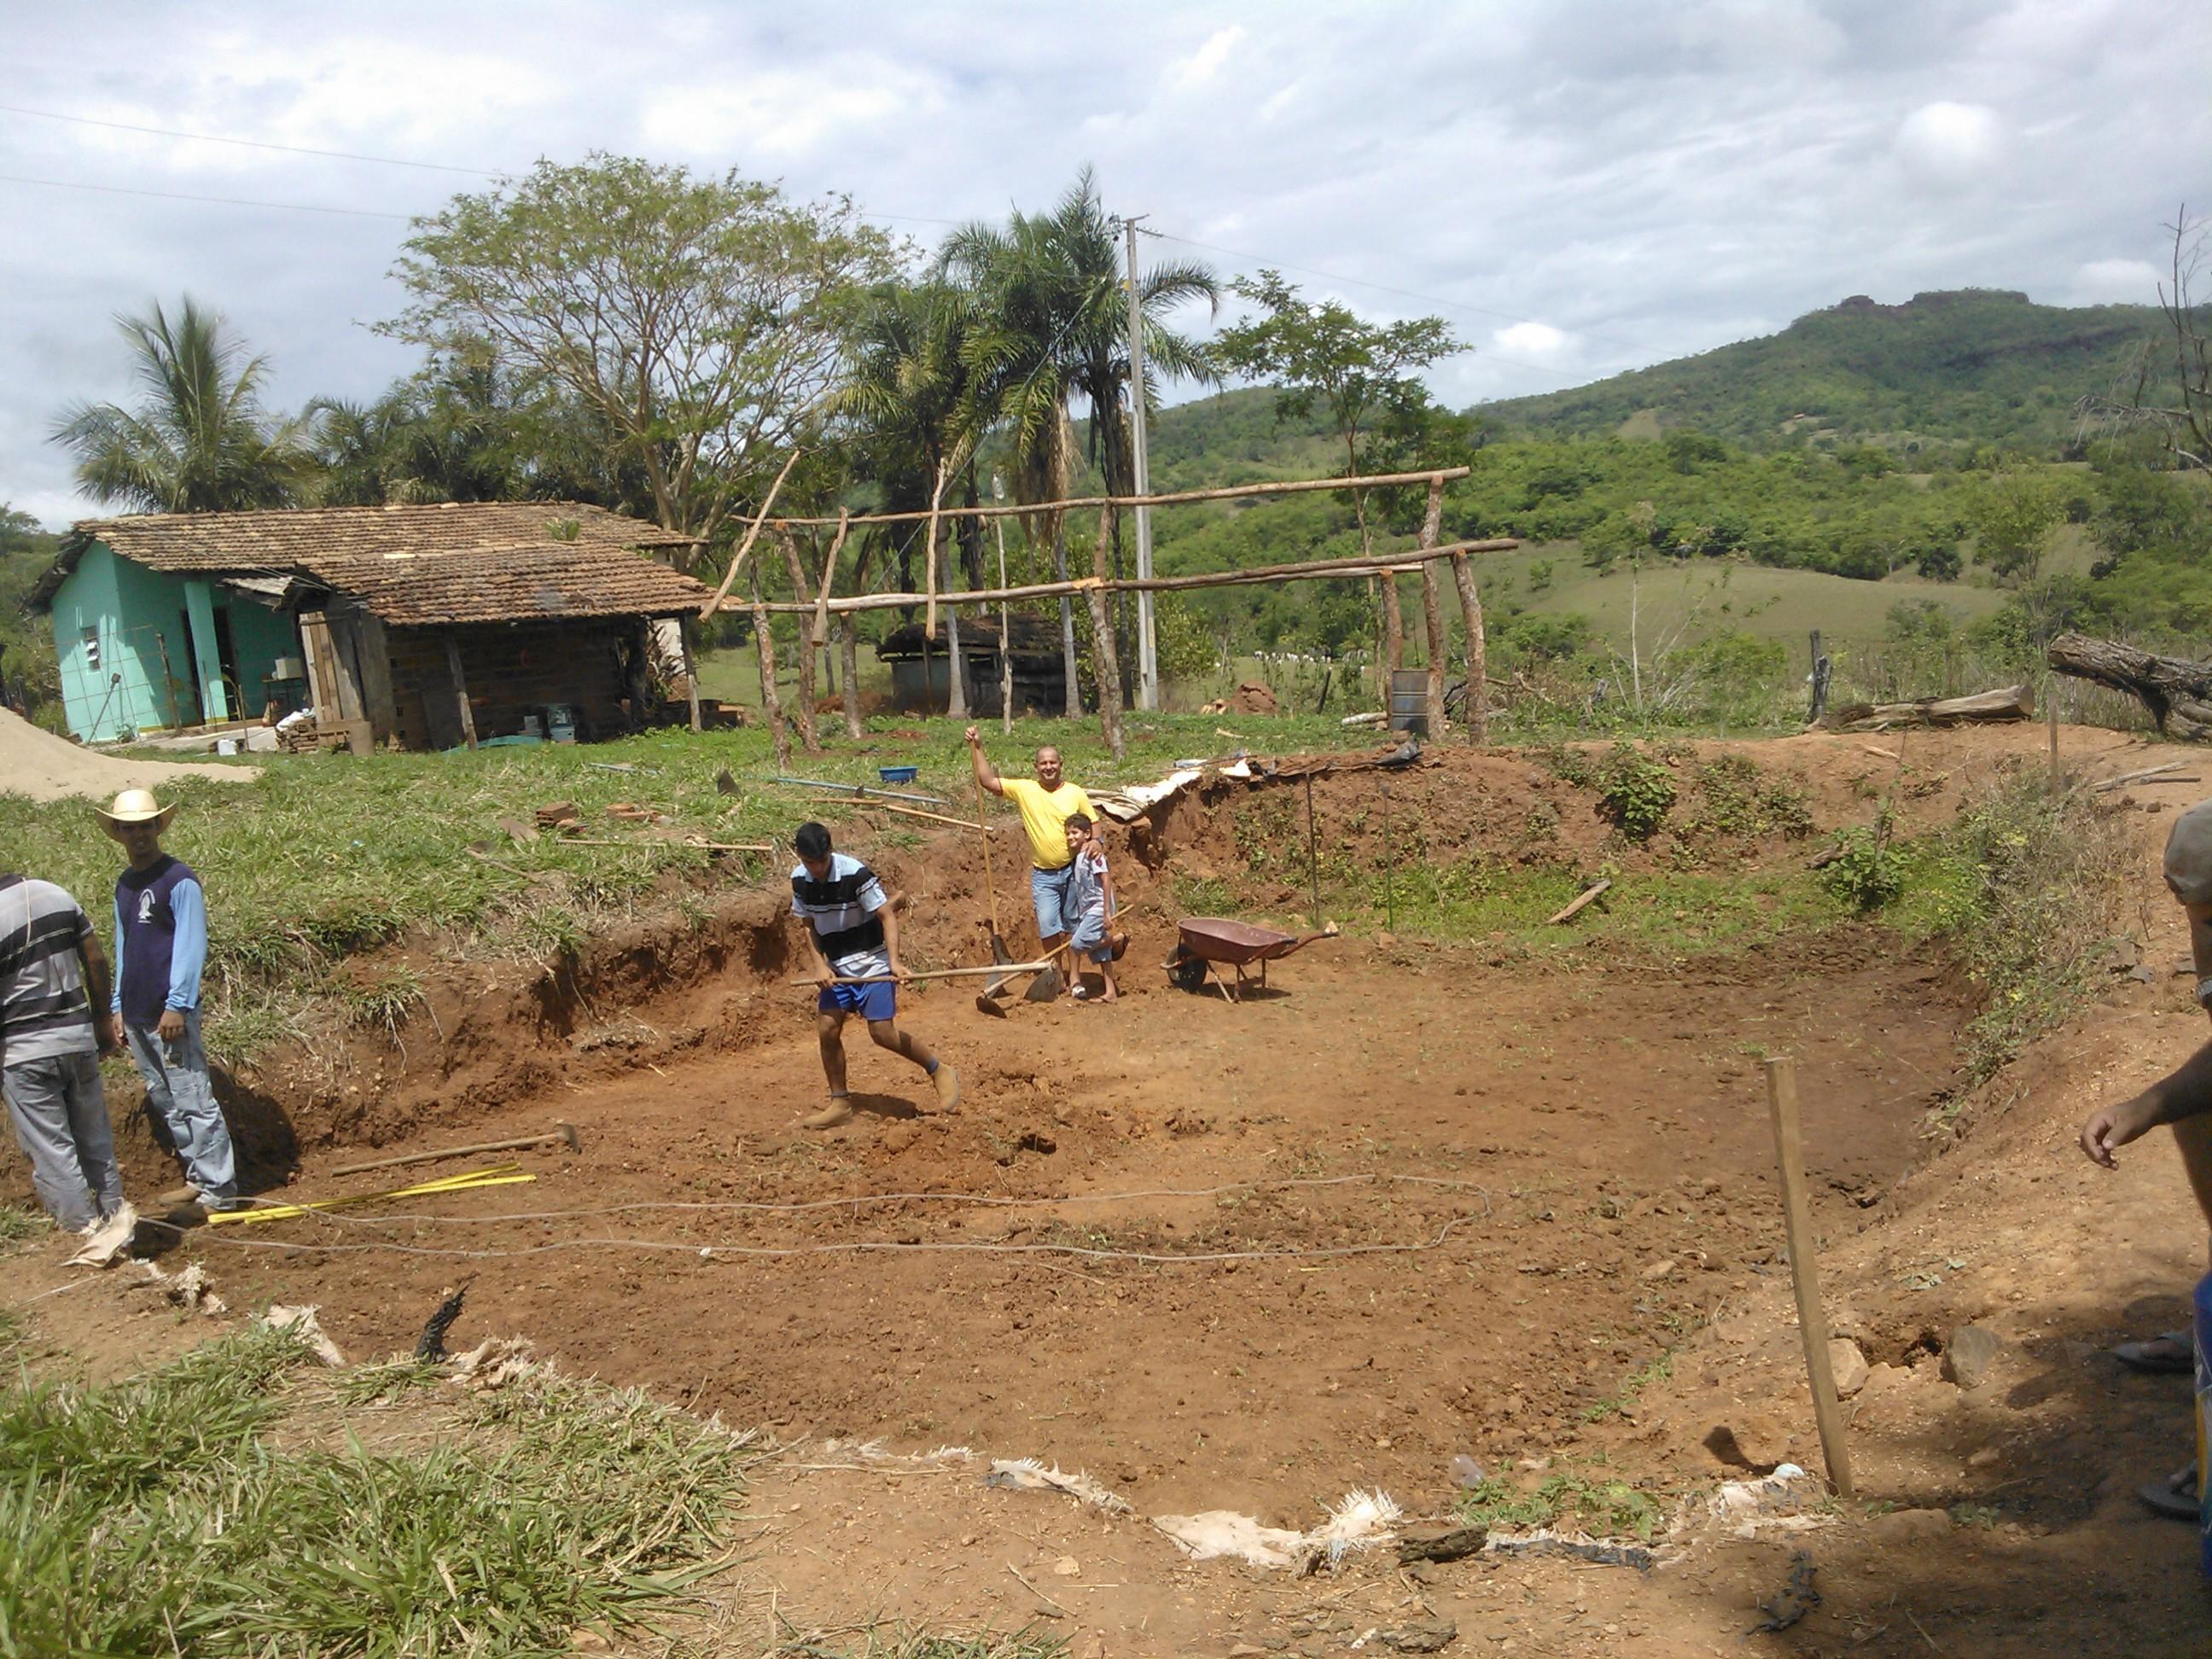 Moiporá Goiás fonte: upload.wikimedia.org